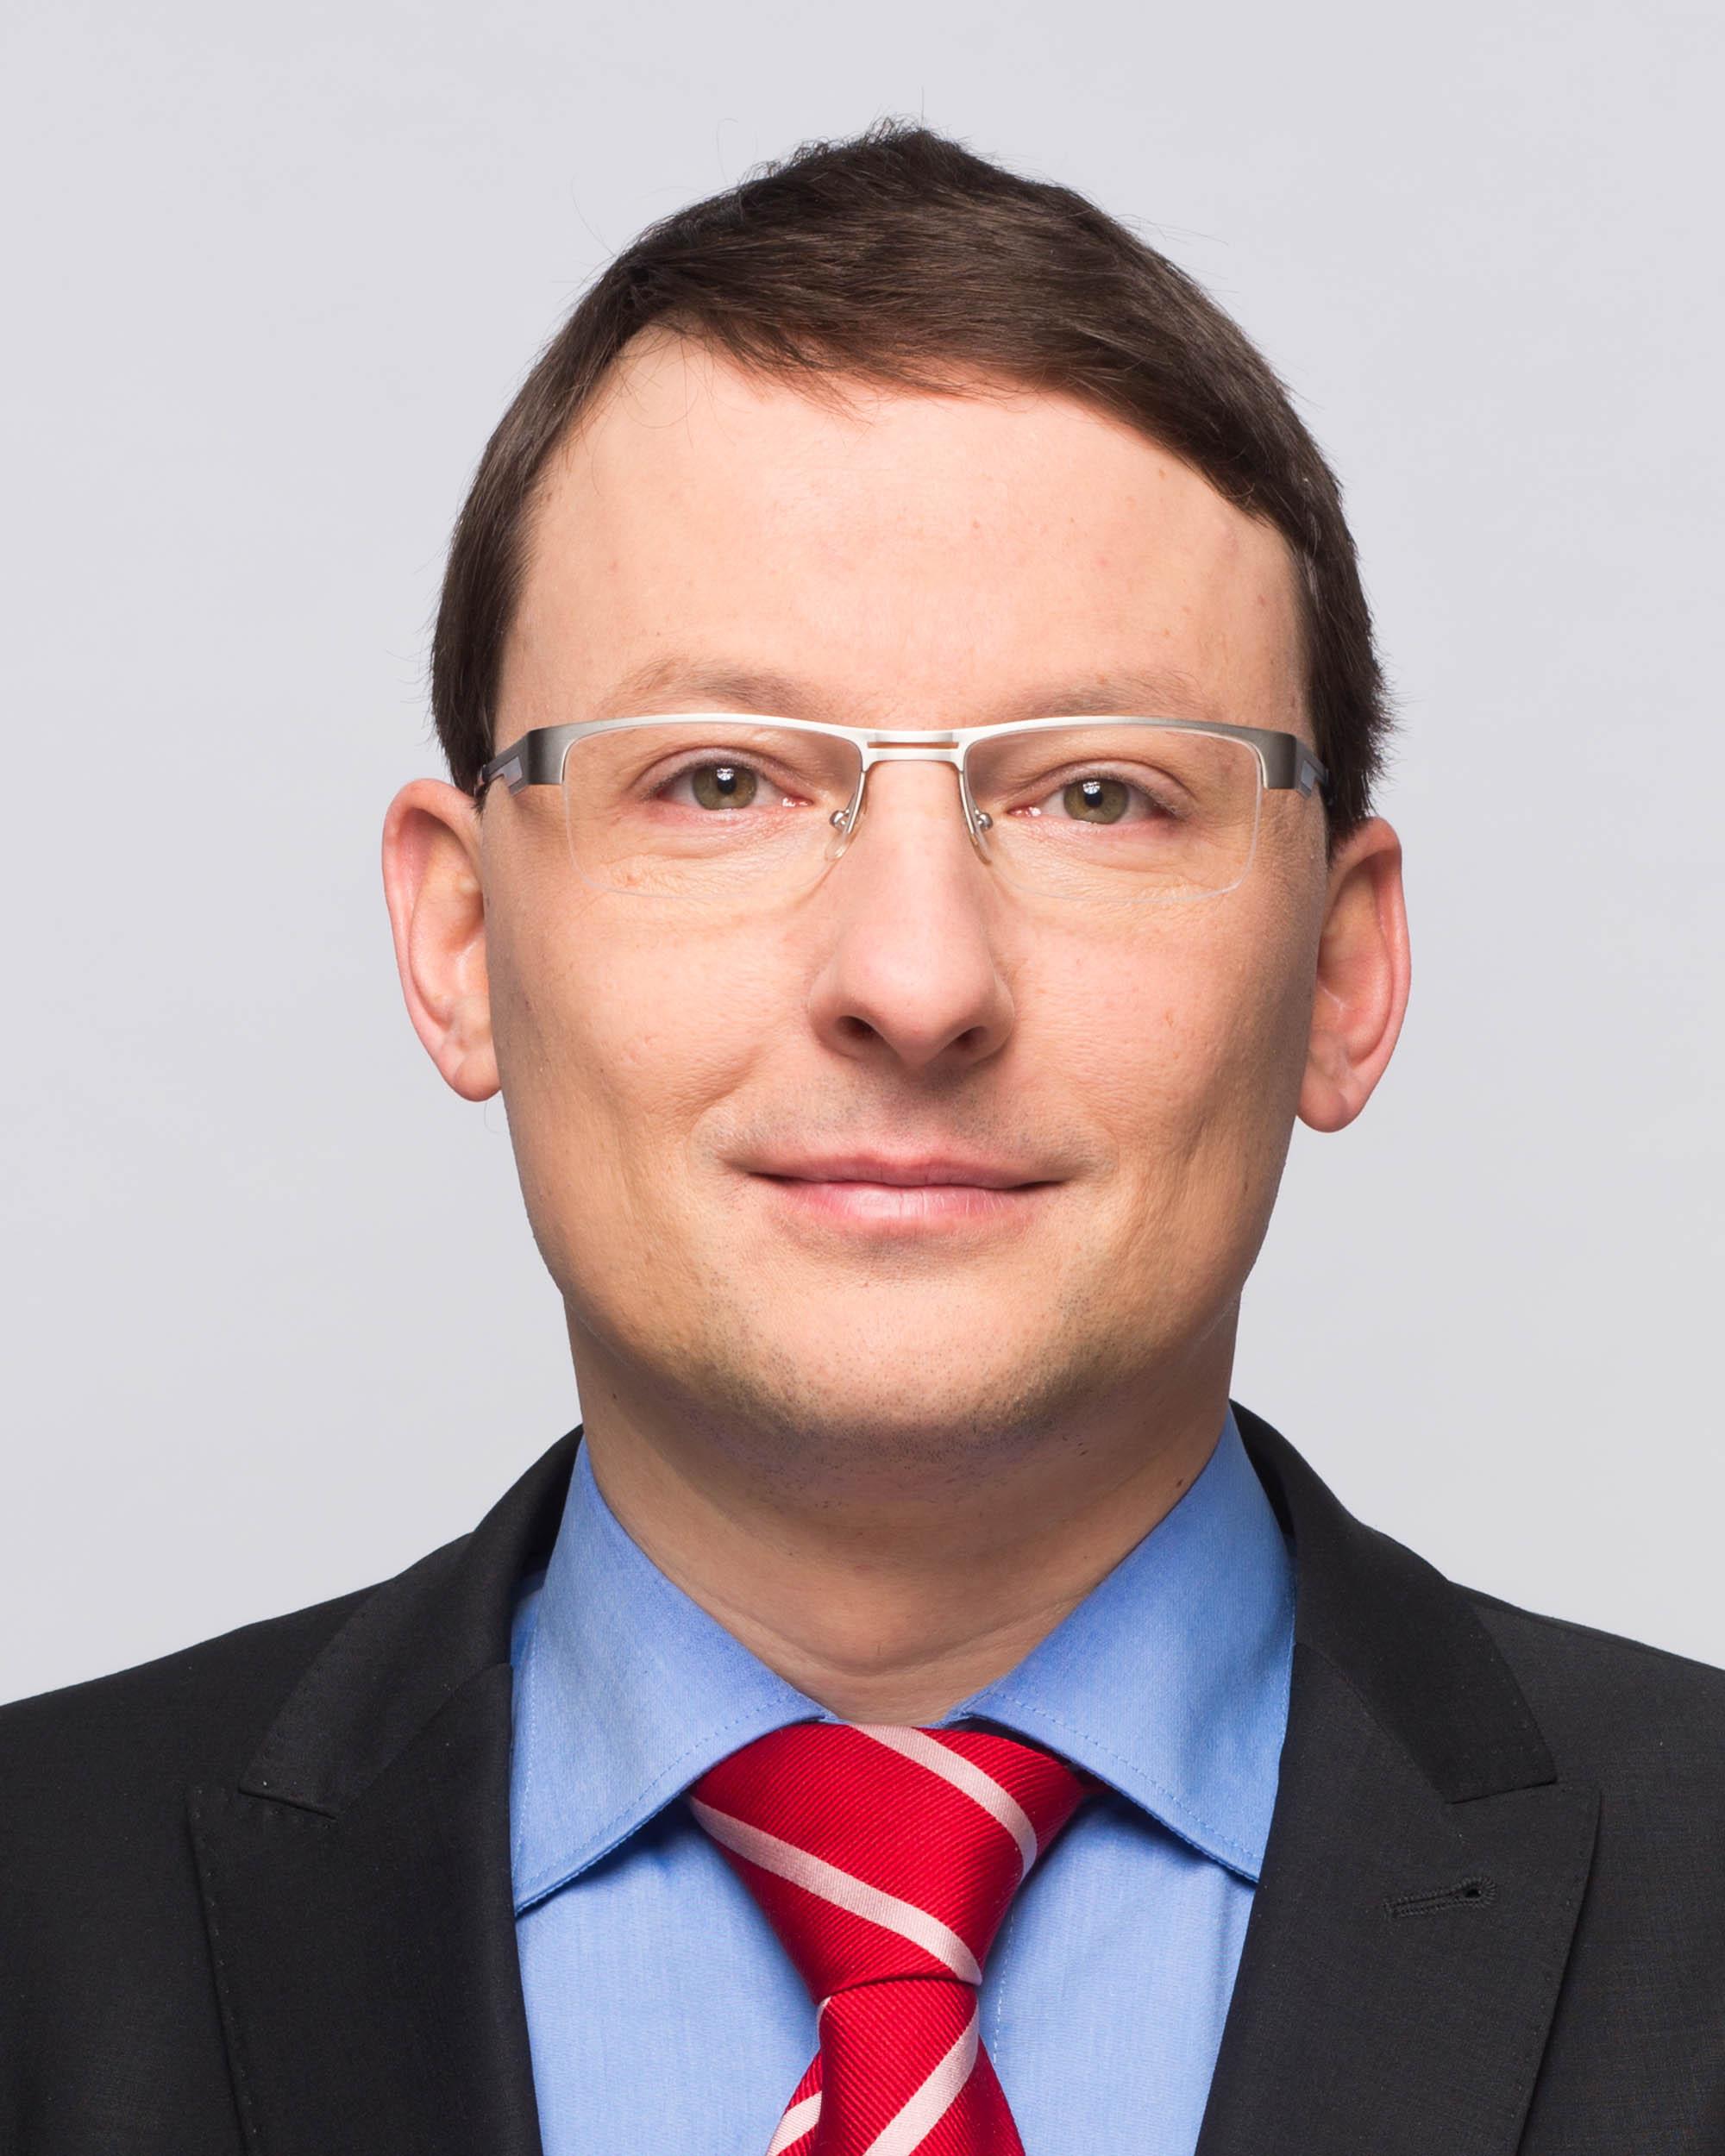 Markus Wotruba